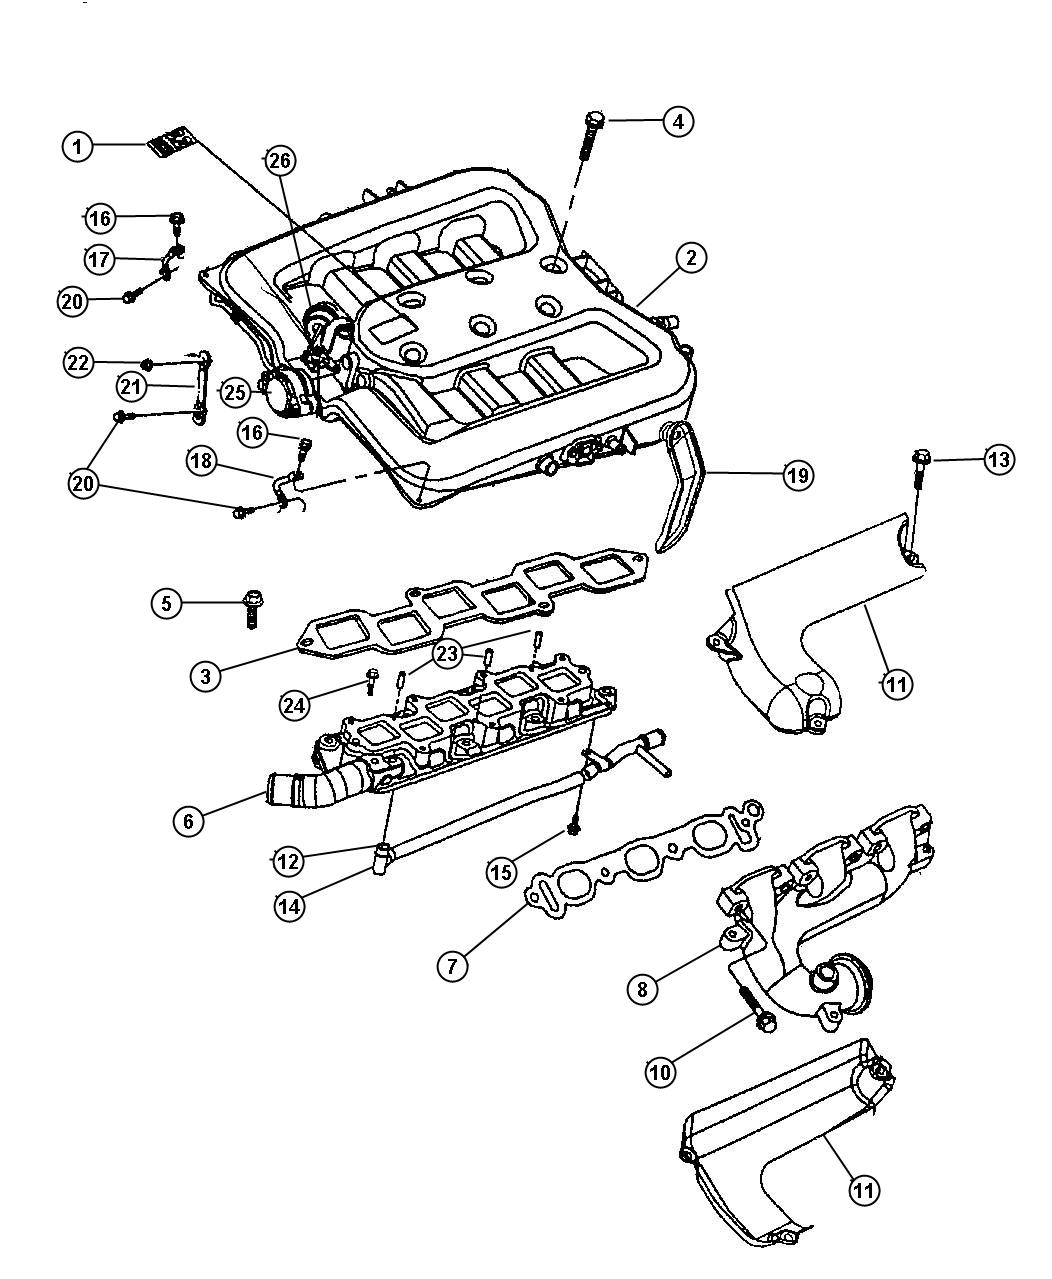 Chrysler 300 Actuator Manifold Tuning Valve Contains An